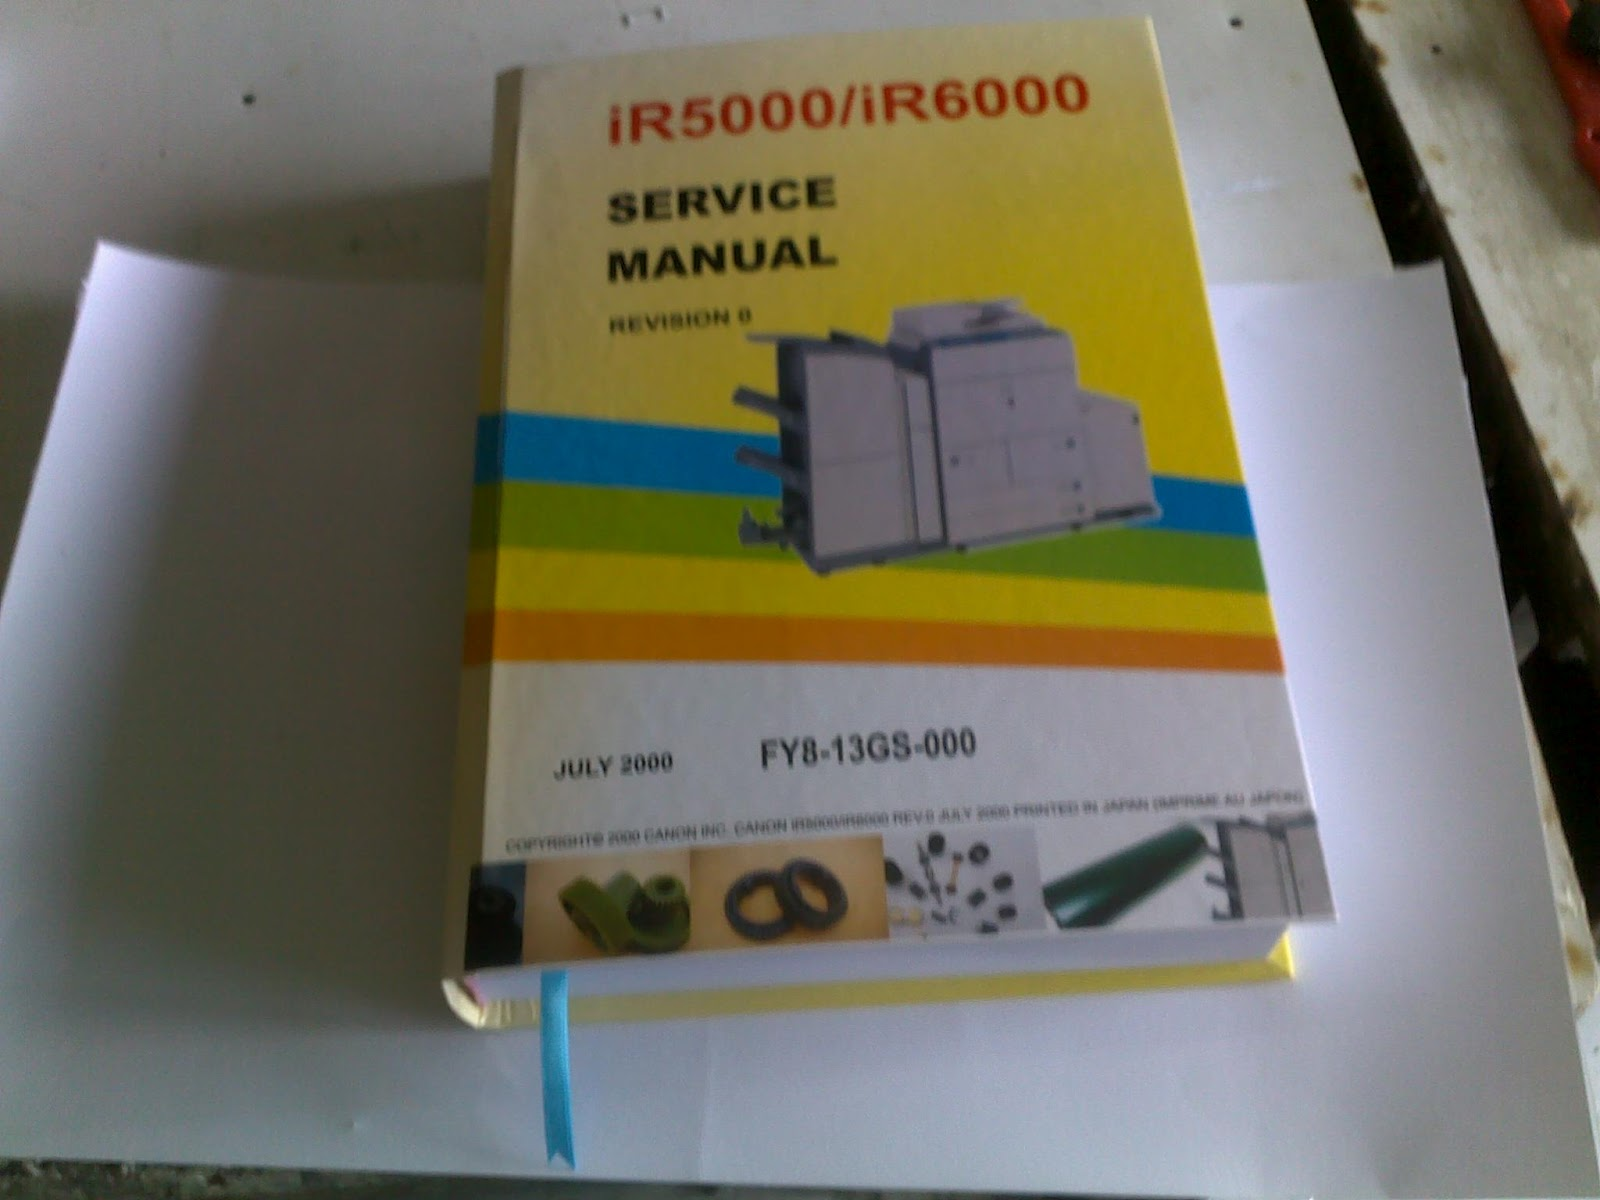 Canon Booklet Trimmer A1 Service Manual Auto Electrical Wiring Diagram Block Canonir5000 Ir5000 Ir6000 U0026 Repair